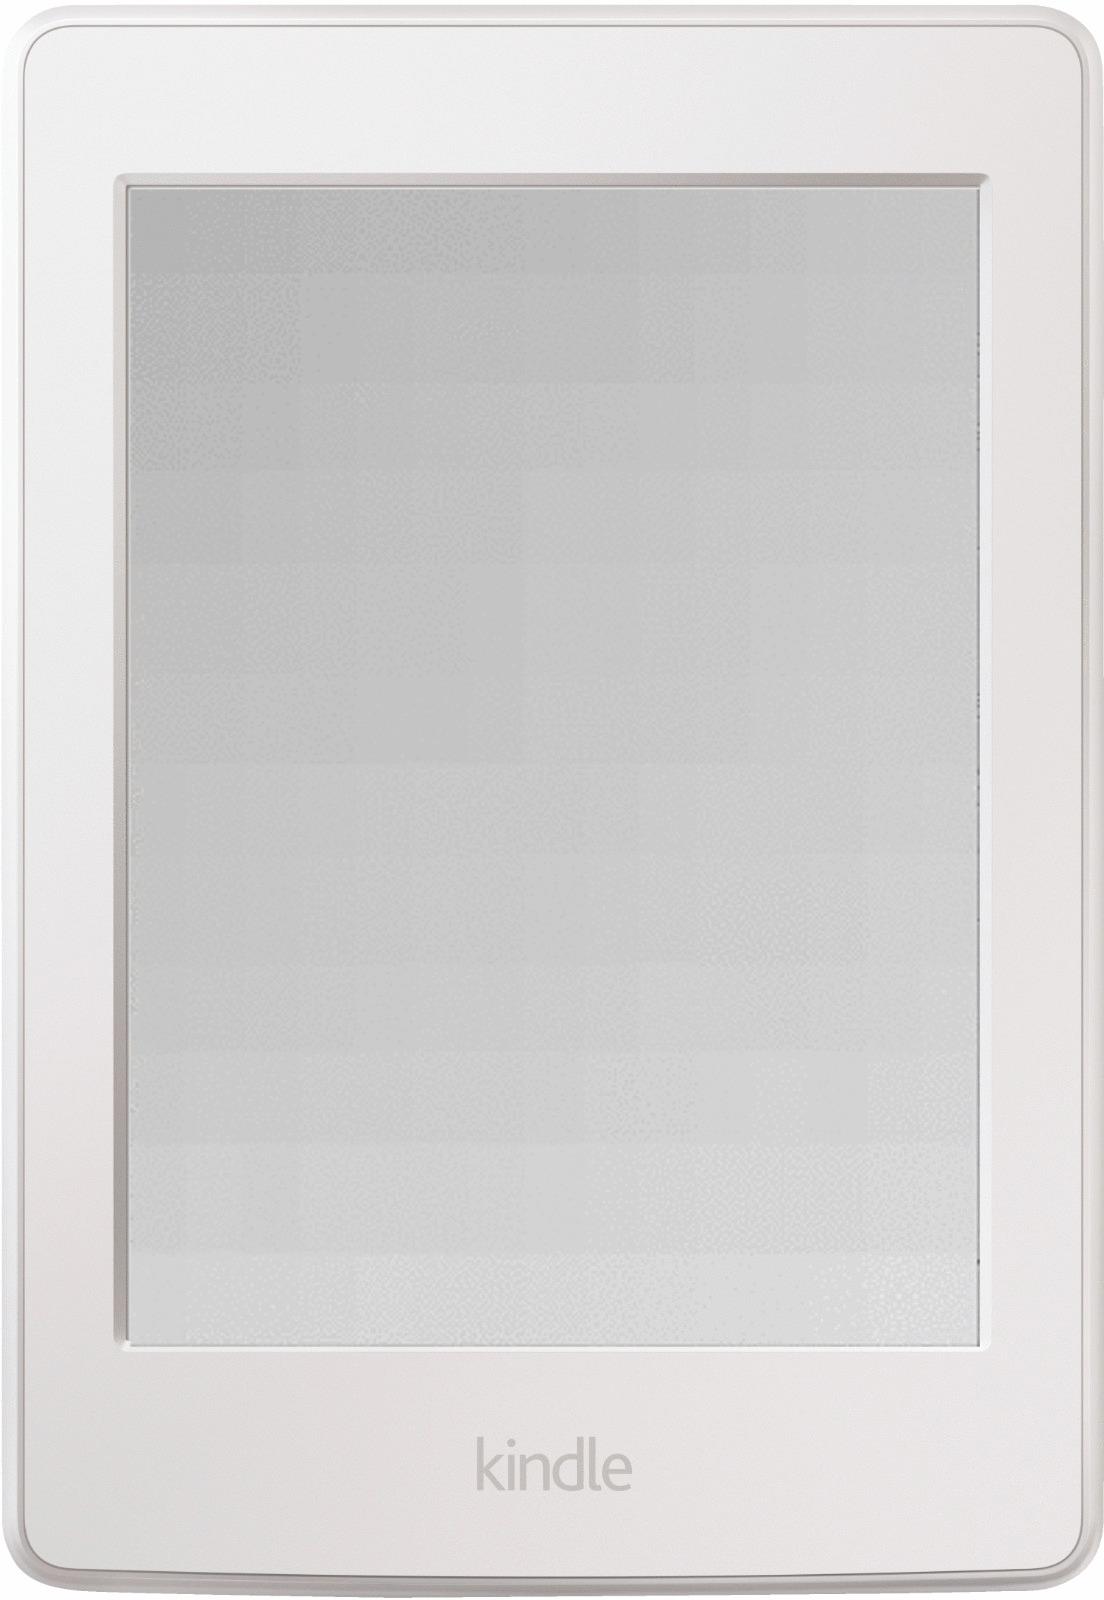 Amazon Kindle Paperwhite 6 4GB [Wi-Fi, 3. Generation] weiß